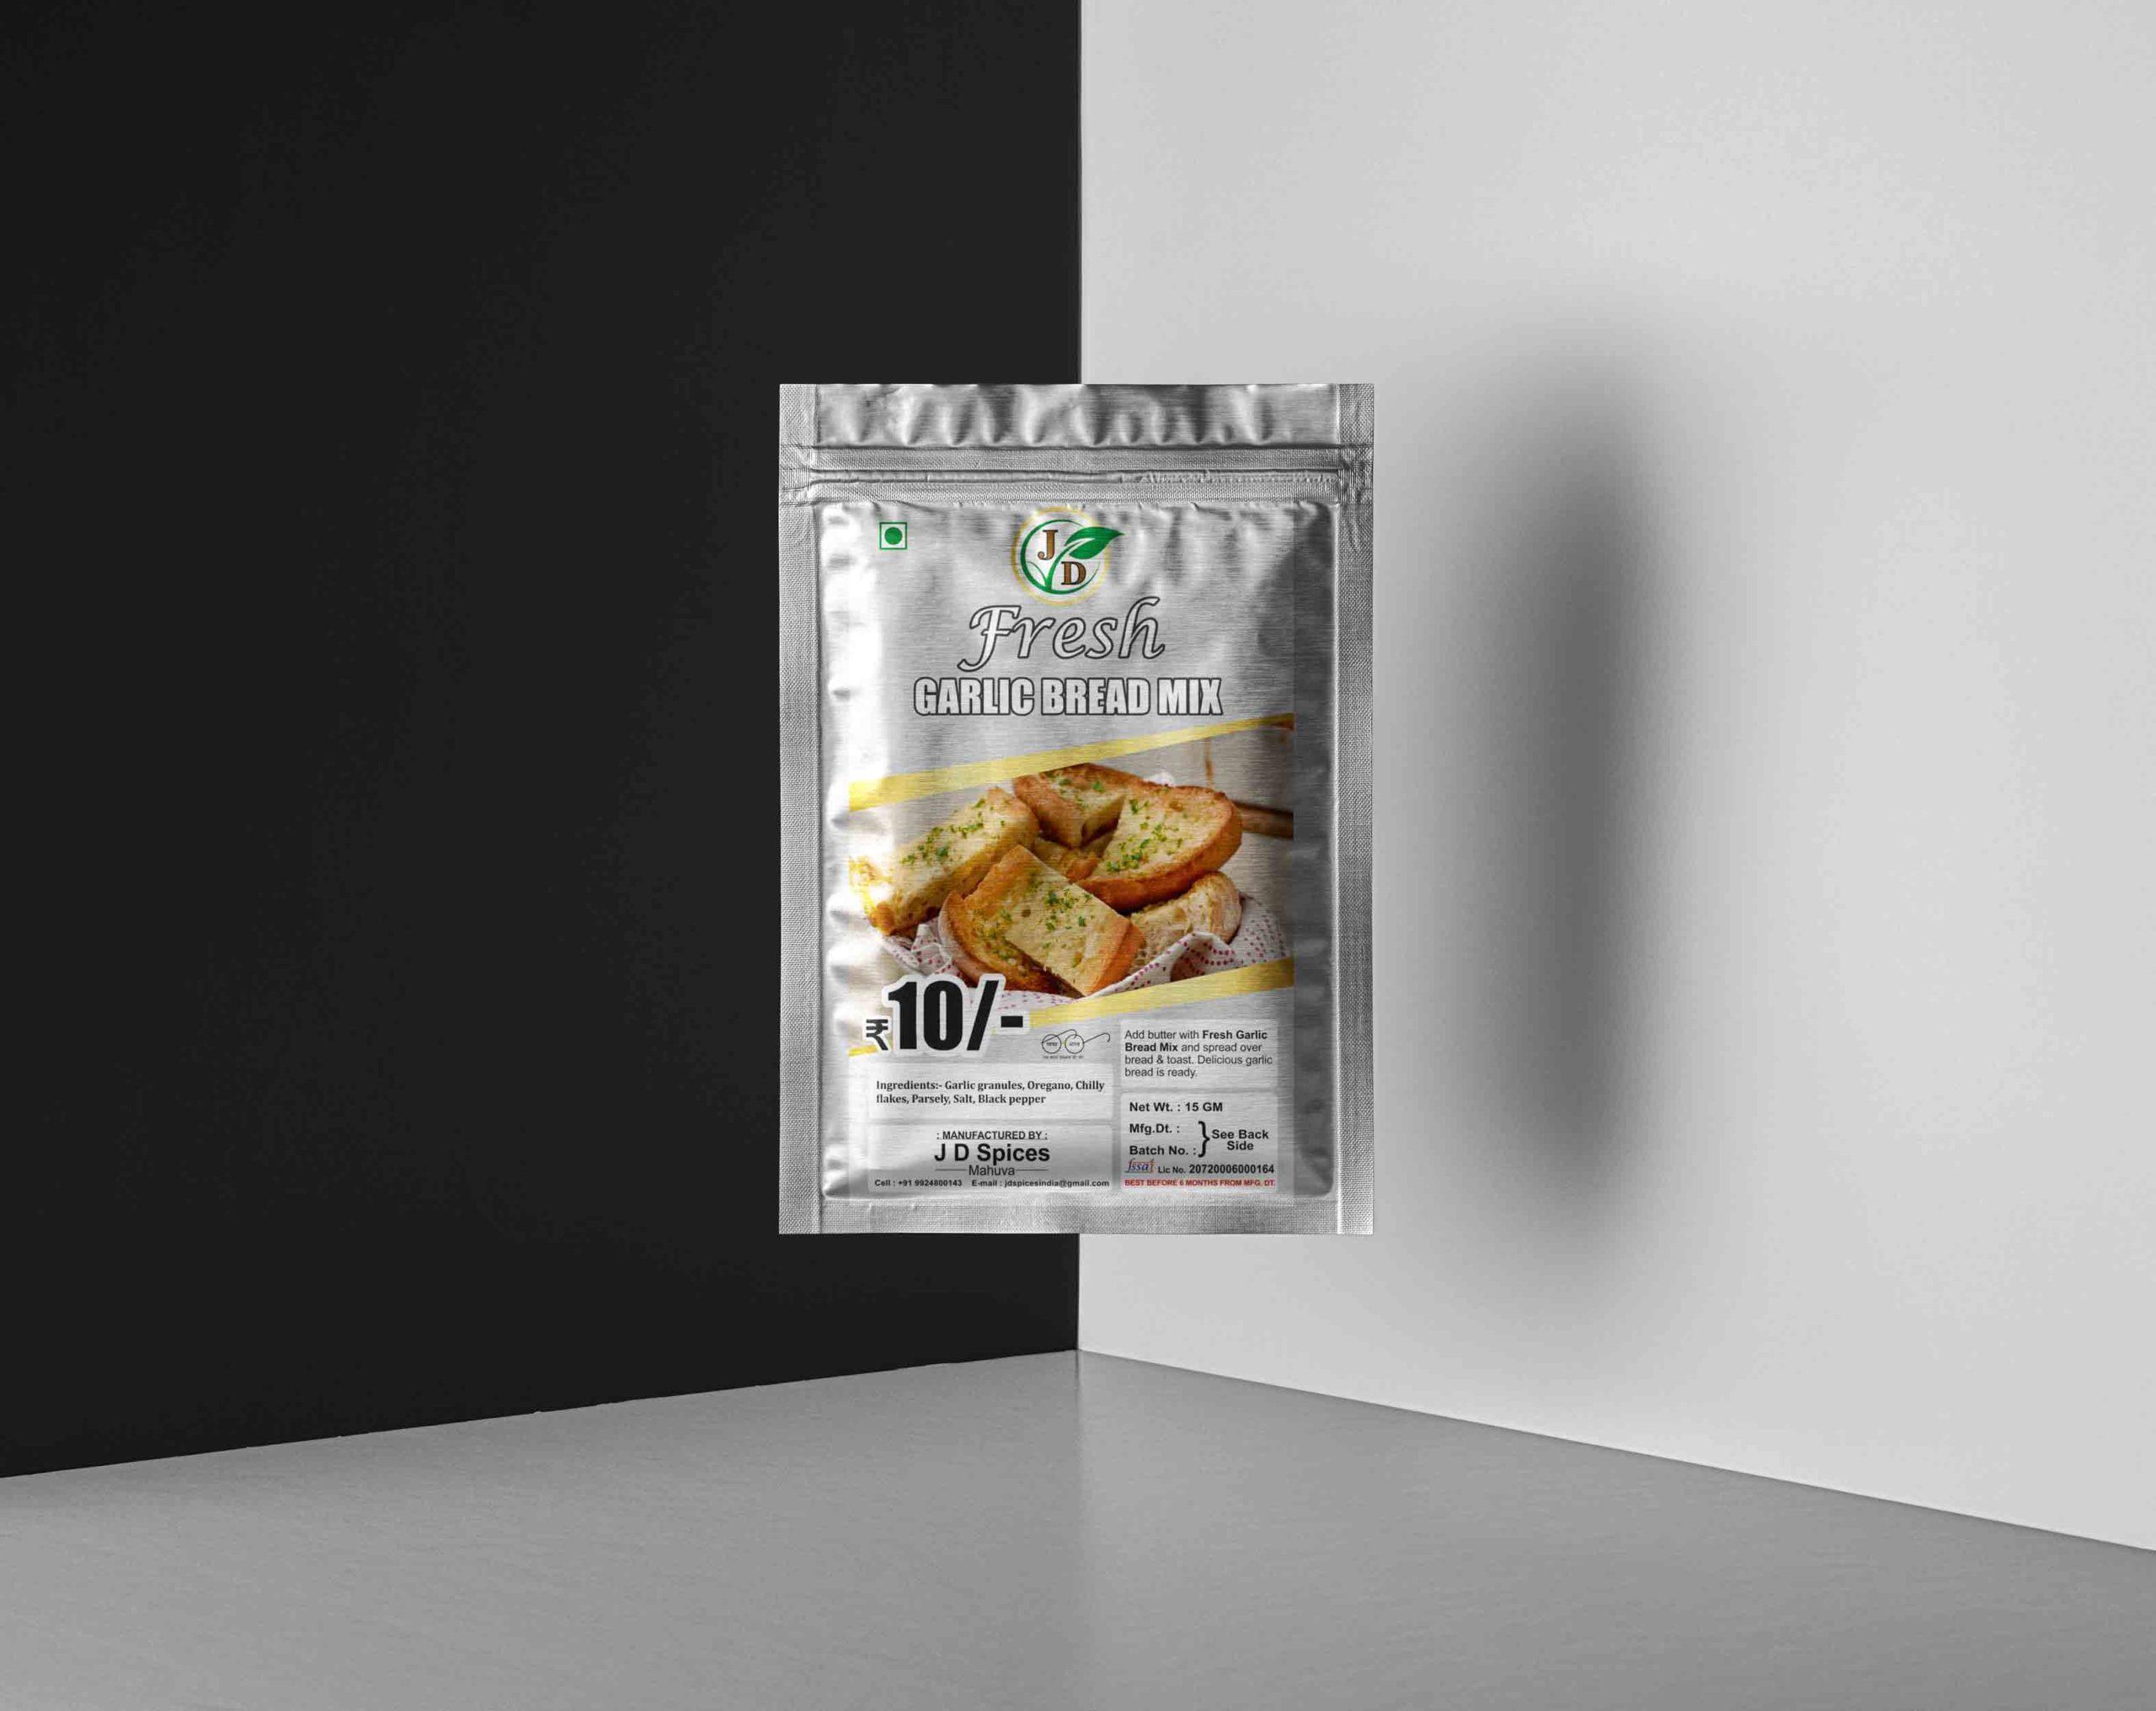 JD spices and food company masala sticker design by Badri Design